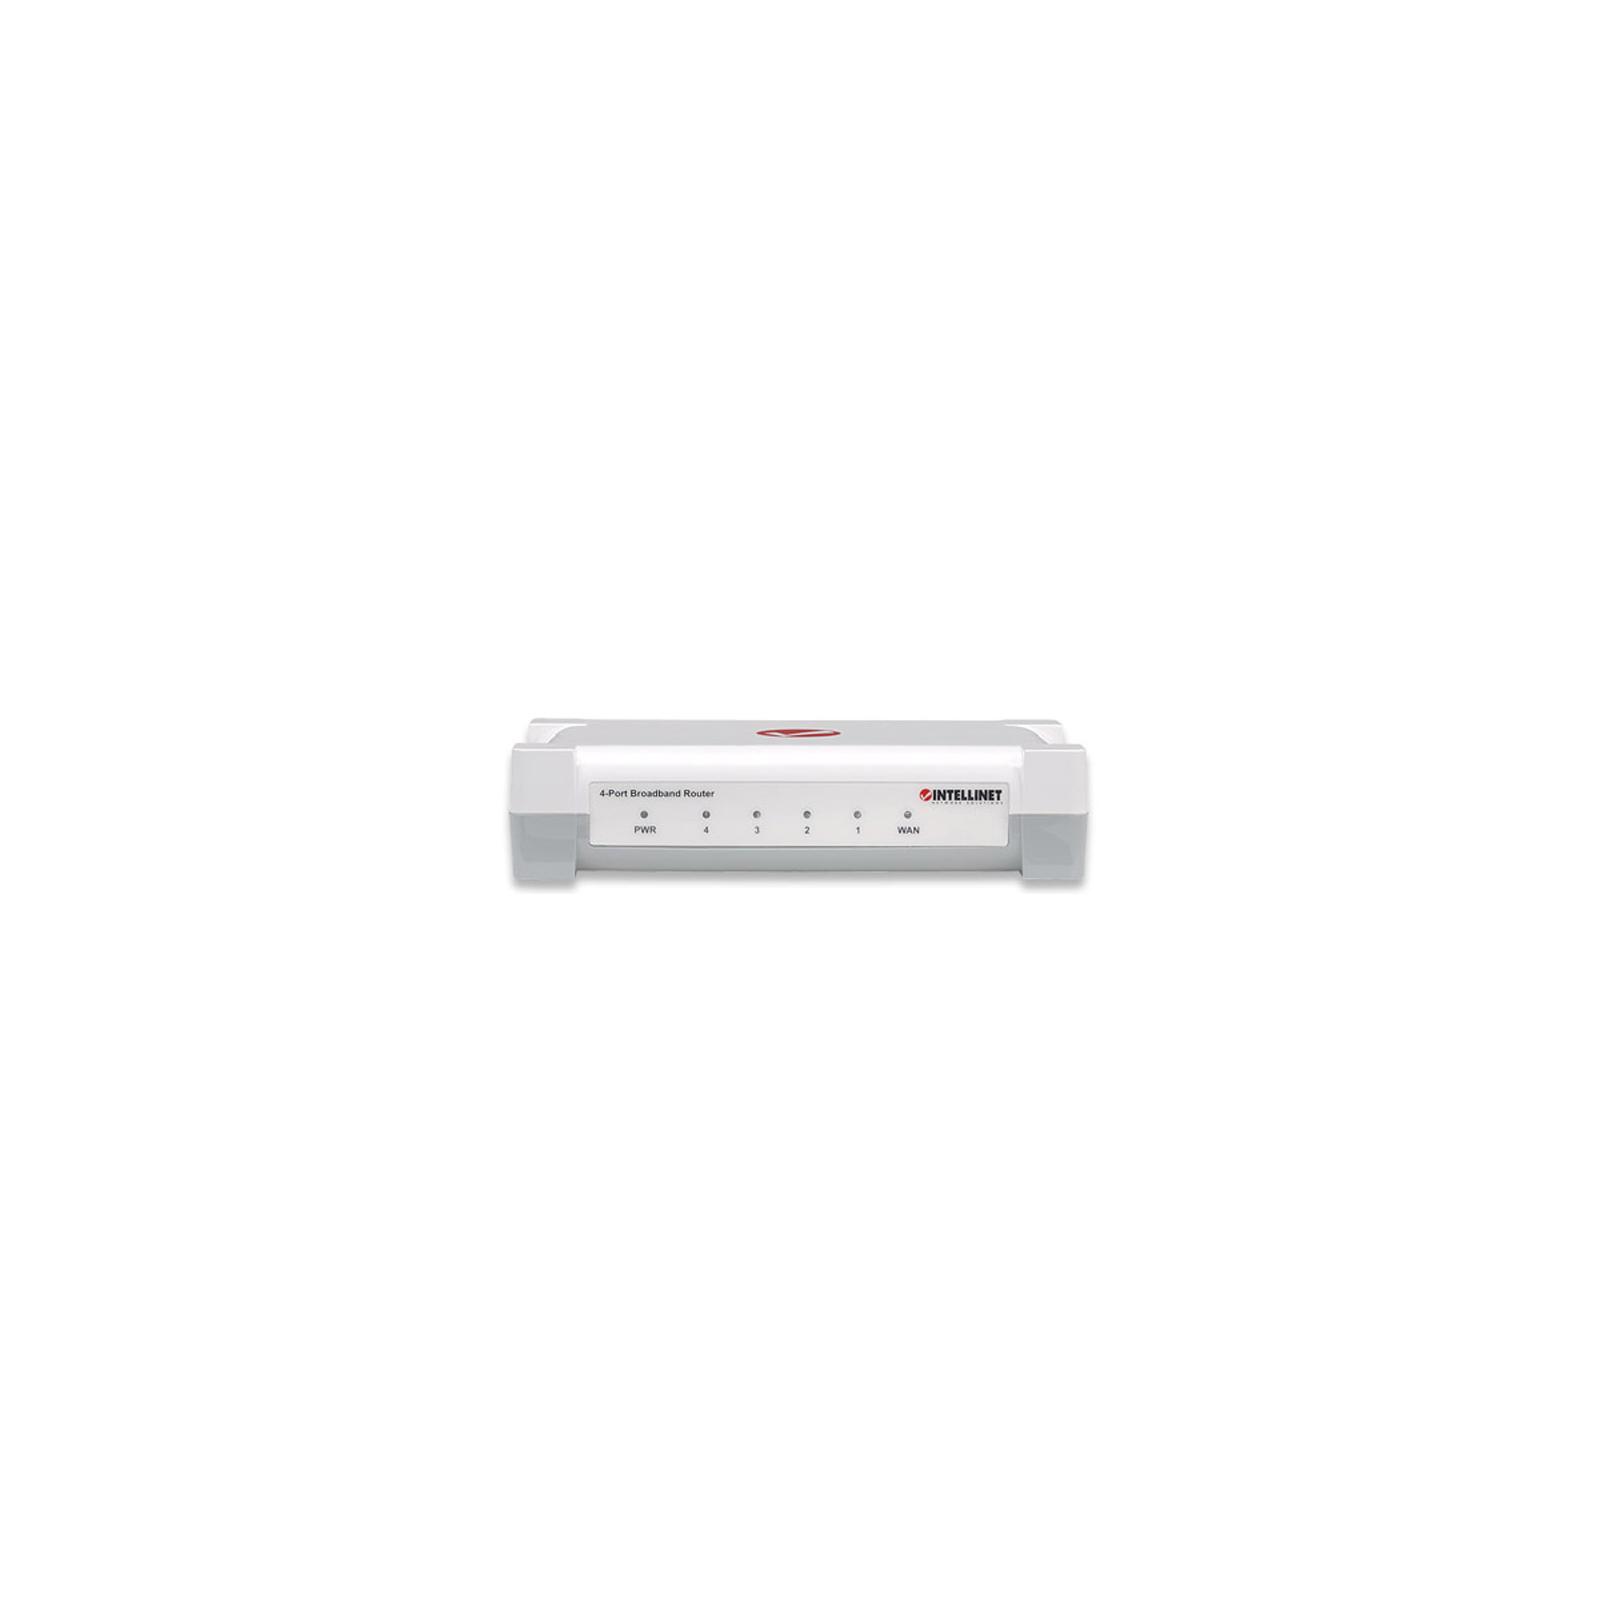 Маршрутизатор Intellinet 4-Port Broadband Router изображение 2